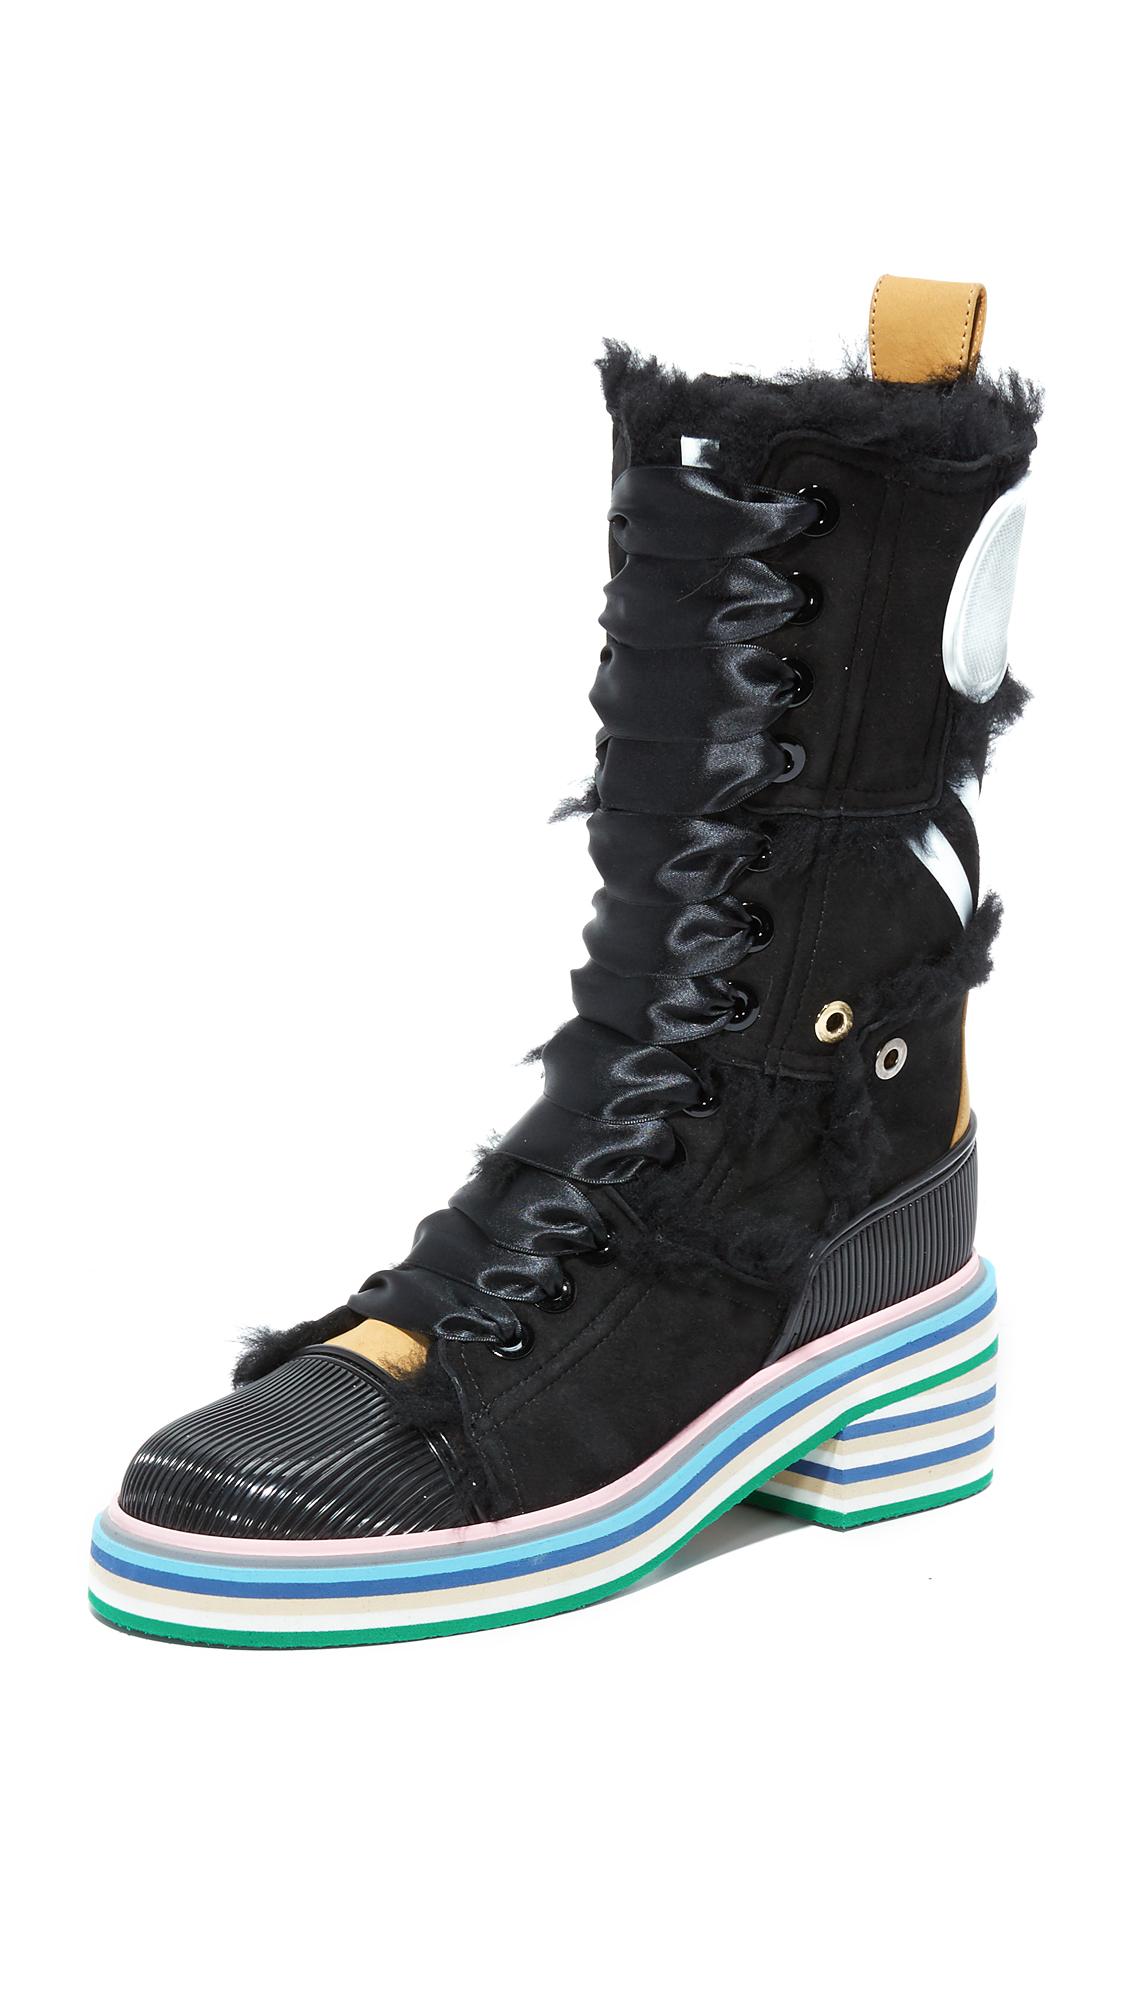 Maison Margiela Boots - Black/Camel/Black